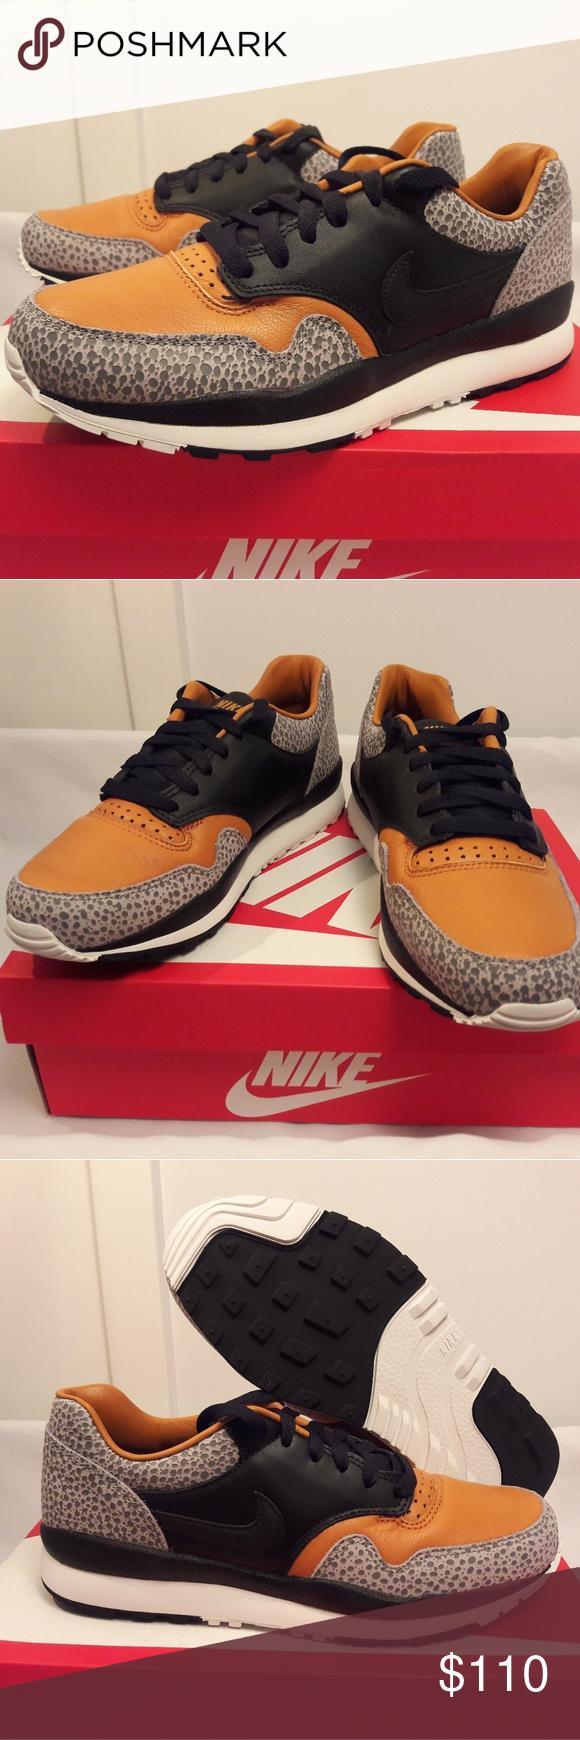 44bf2641e80 Nike Air Safari QS OG Jungle Black Monarch Shoes AO3295-001 Size  Mens Size